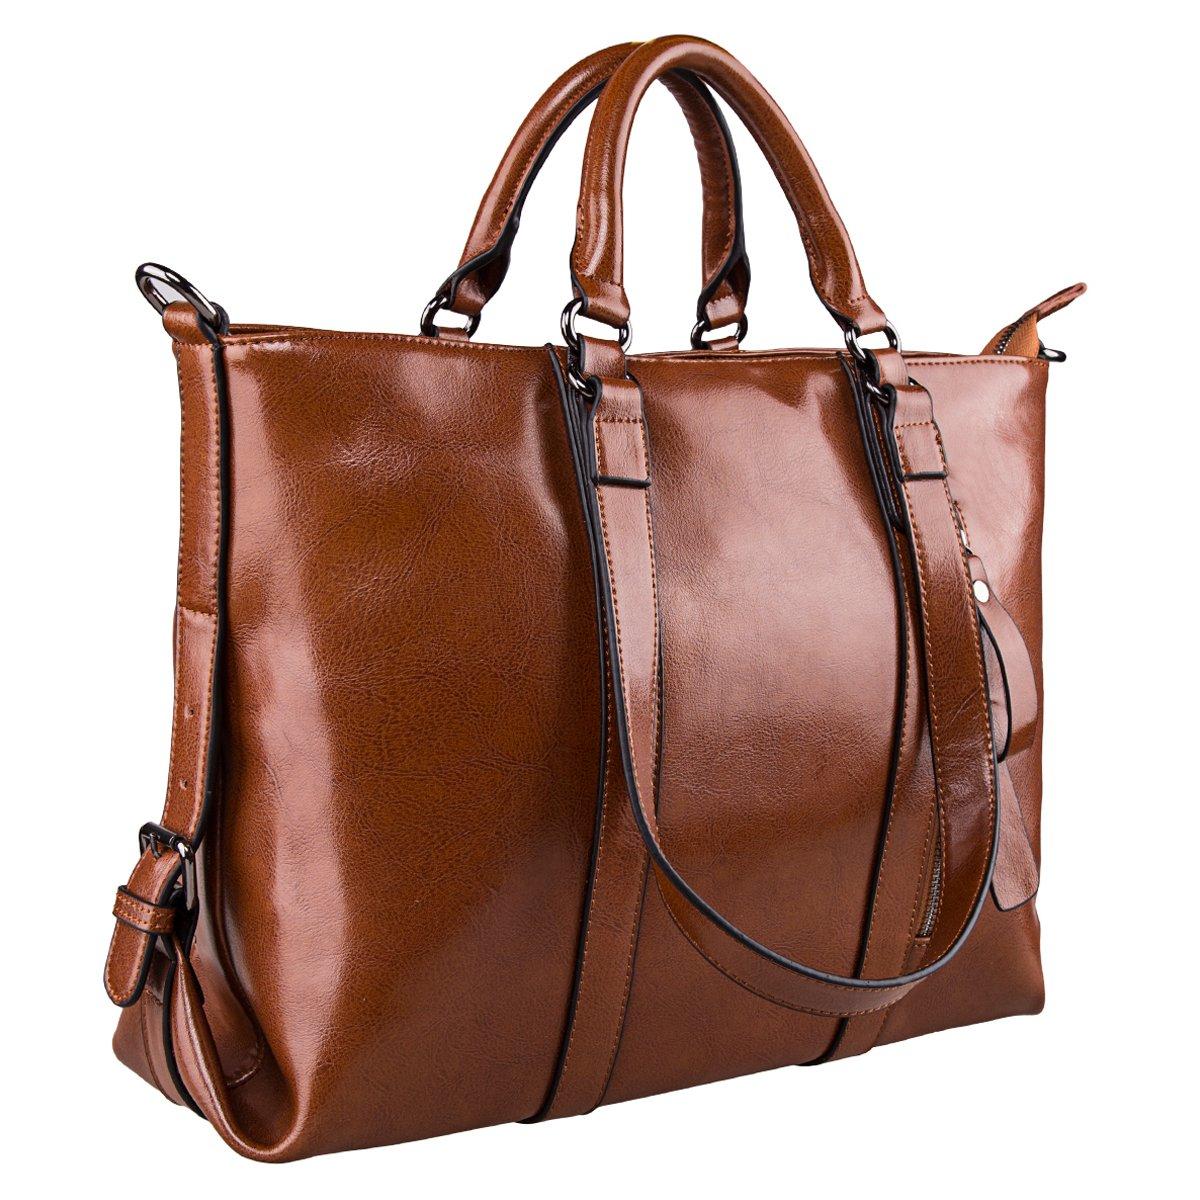 261e8f82959b S-ZONE 3-Way Women Genuine Leather Shoulder Bag Work Tote Handbag ...